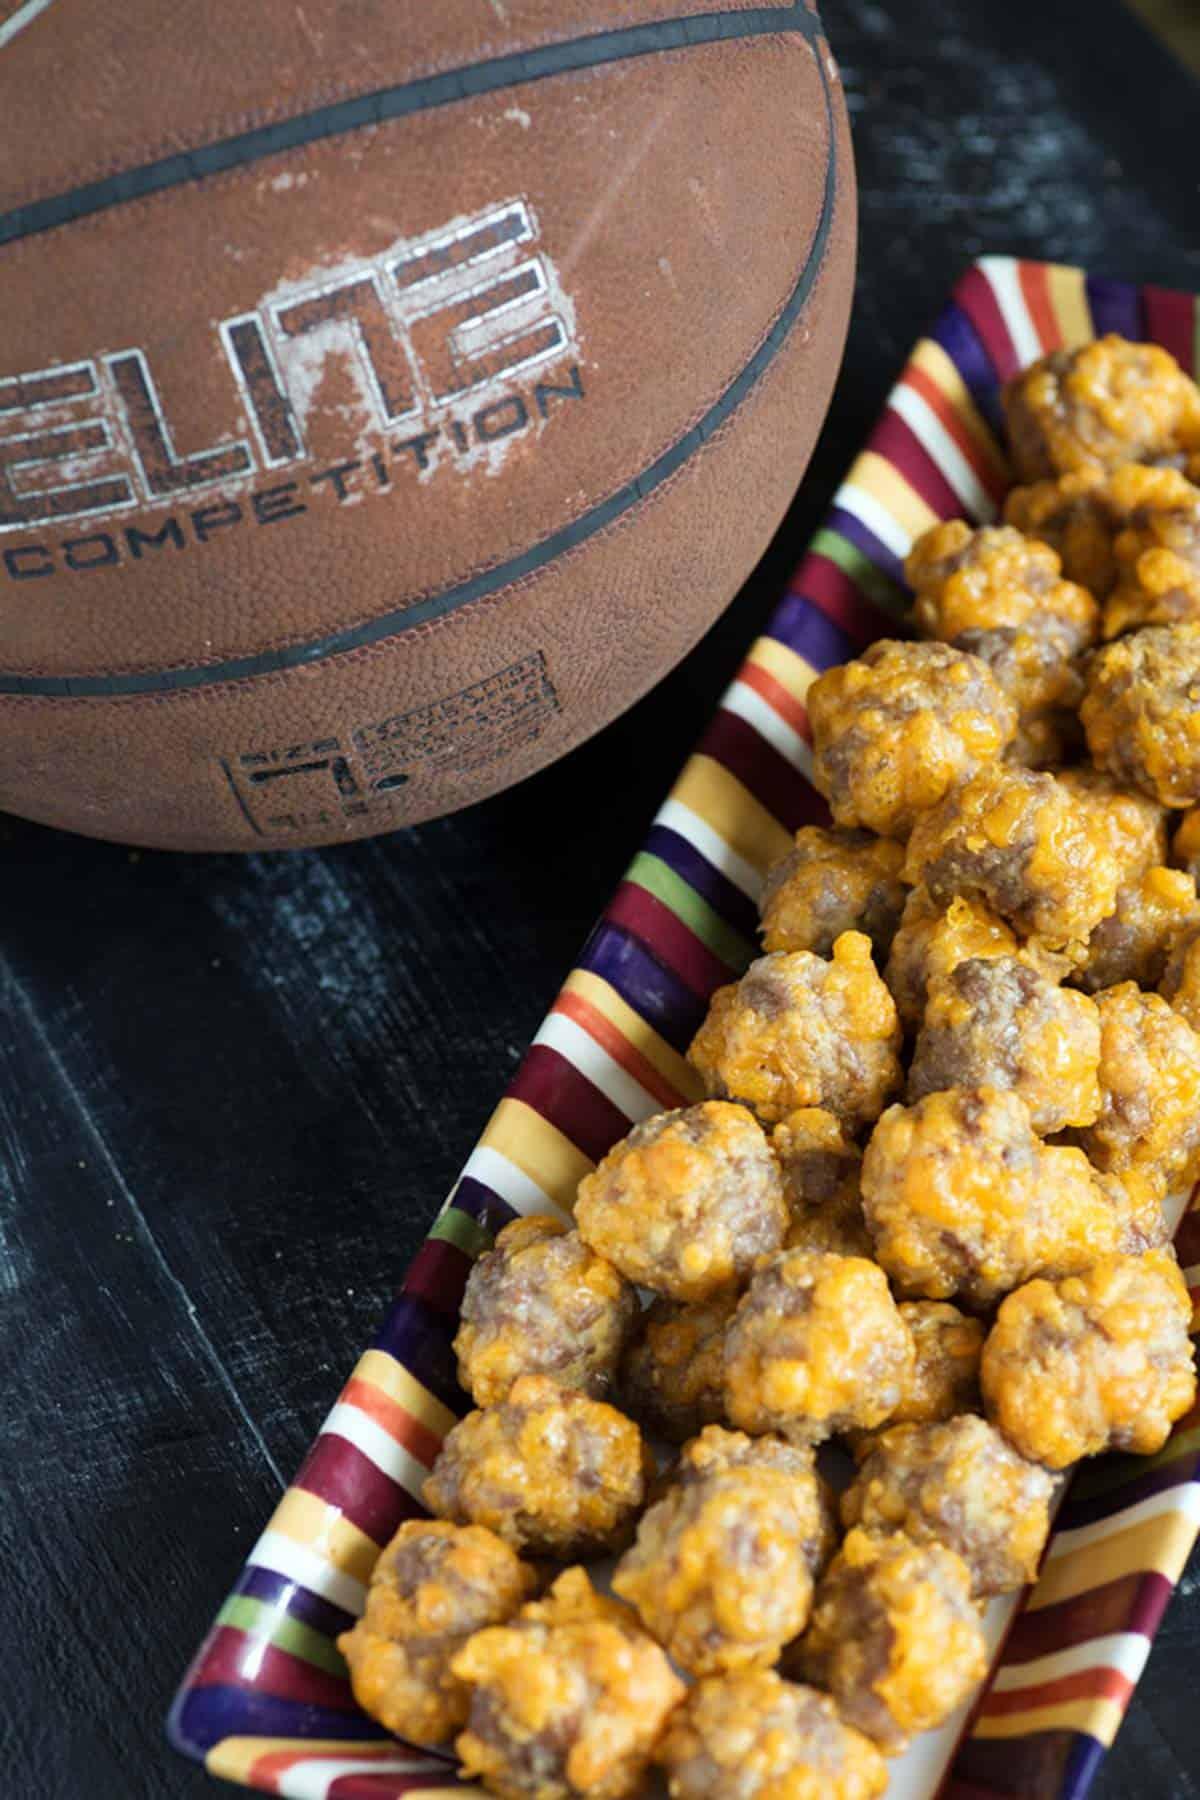 A platter of sausage balls next to a basketball.